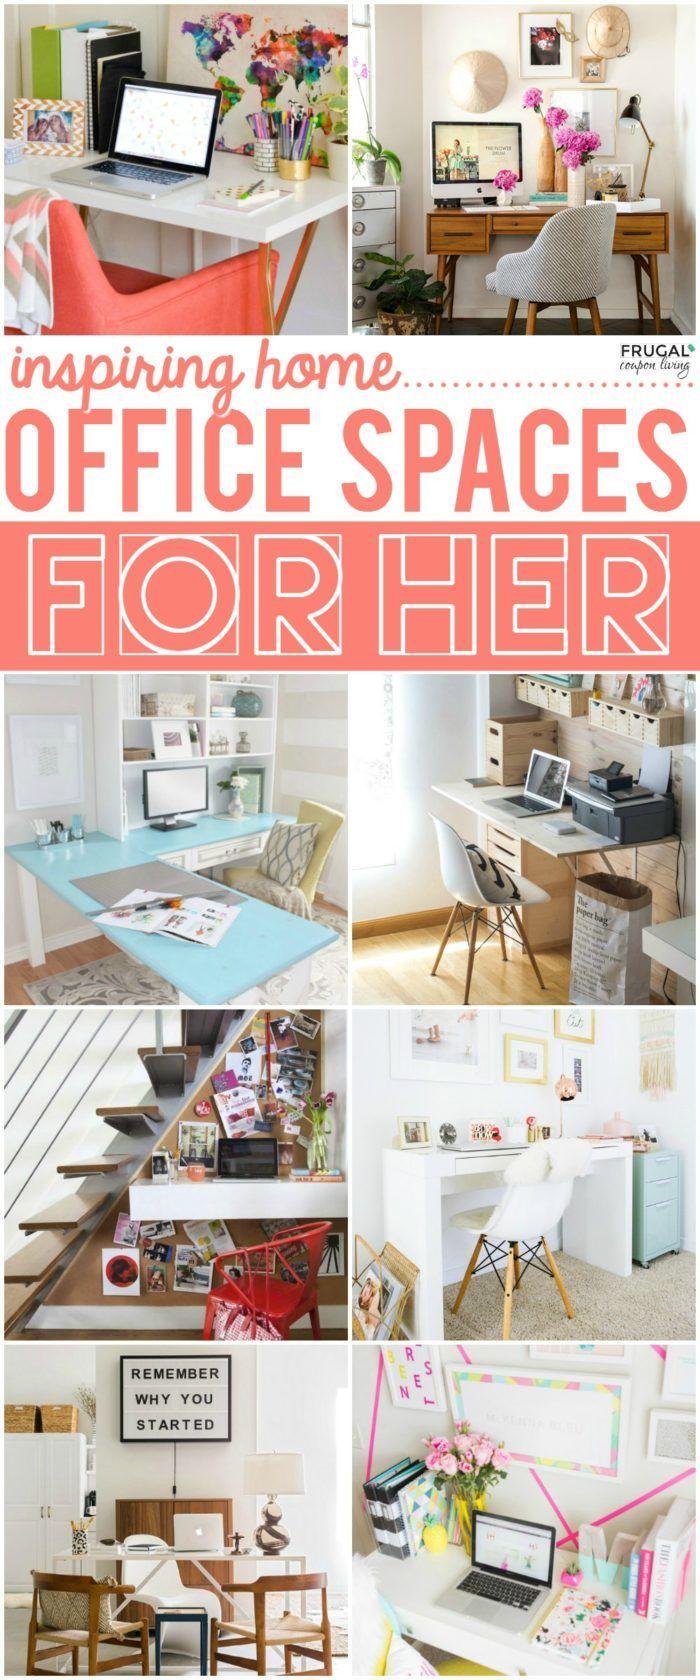 Inspiring home office decor ideas for her office organisation